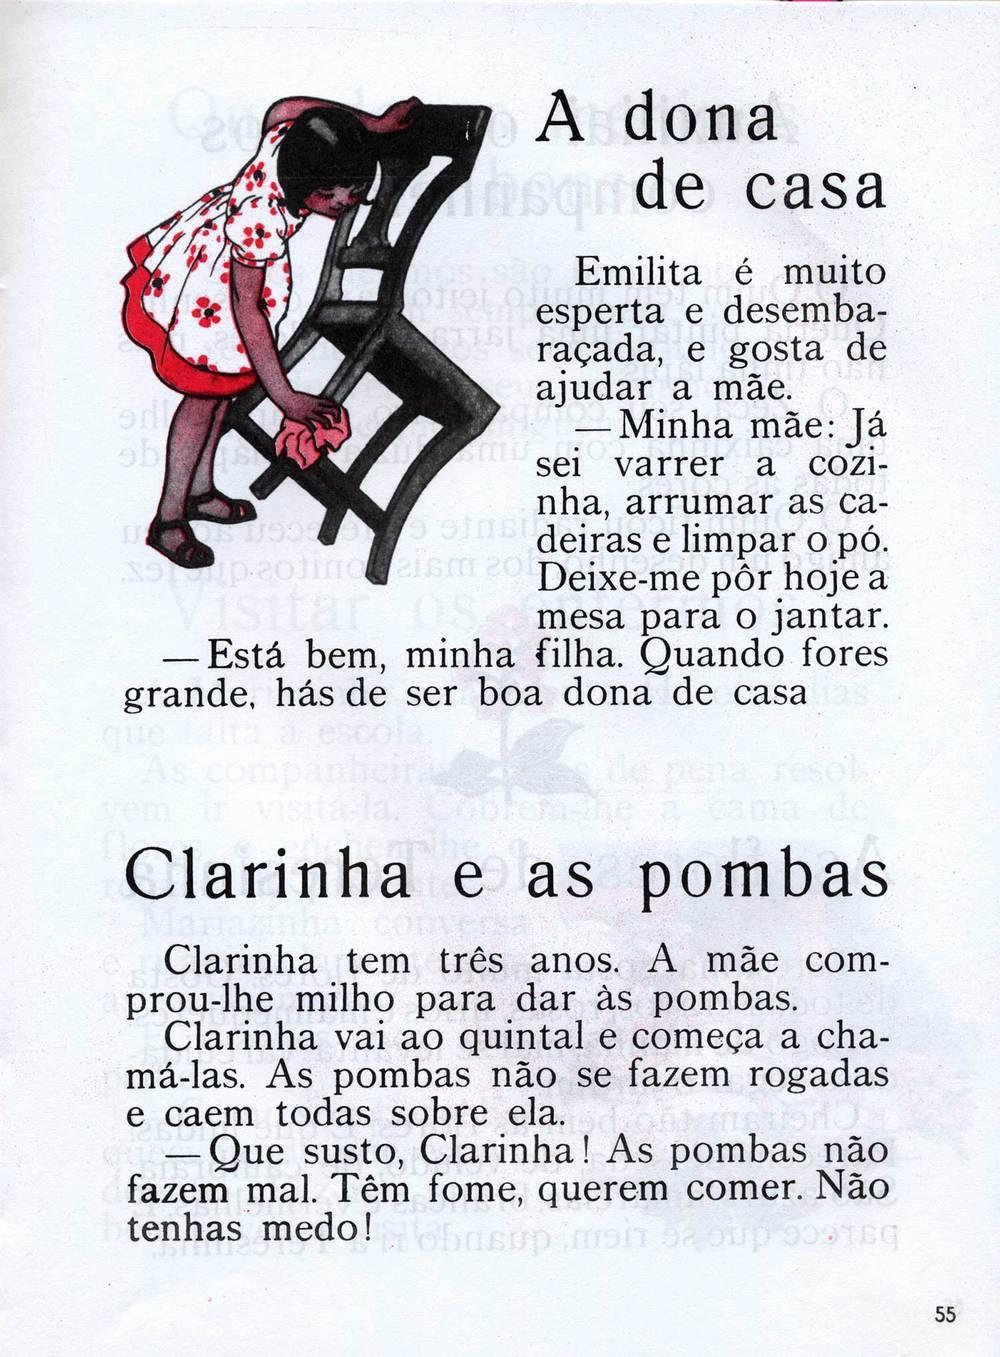 pt_textbk1_055_OLivroDaPrimeiraClasse_1954.jpg